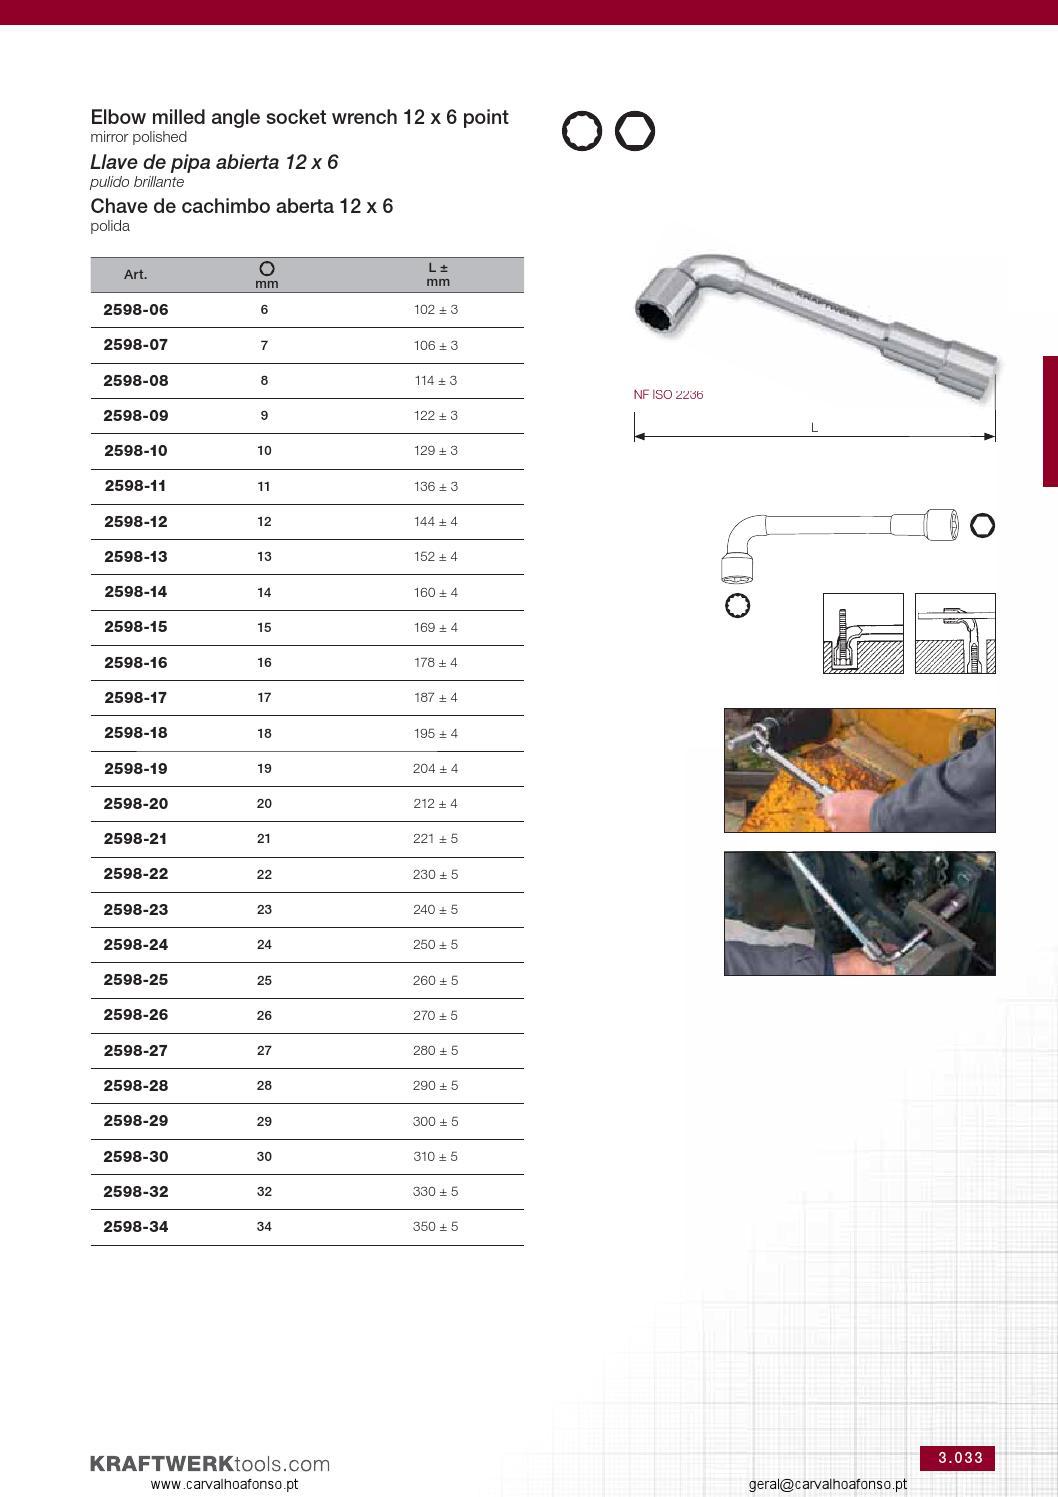 24 V Prowarm 200W9MMATONLY 200w Underfloor Heating Mat Covers 9m2 1800 W